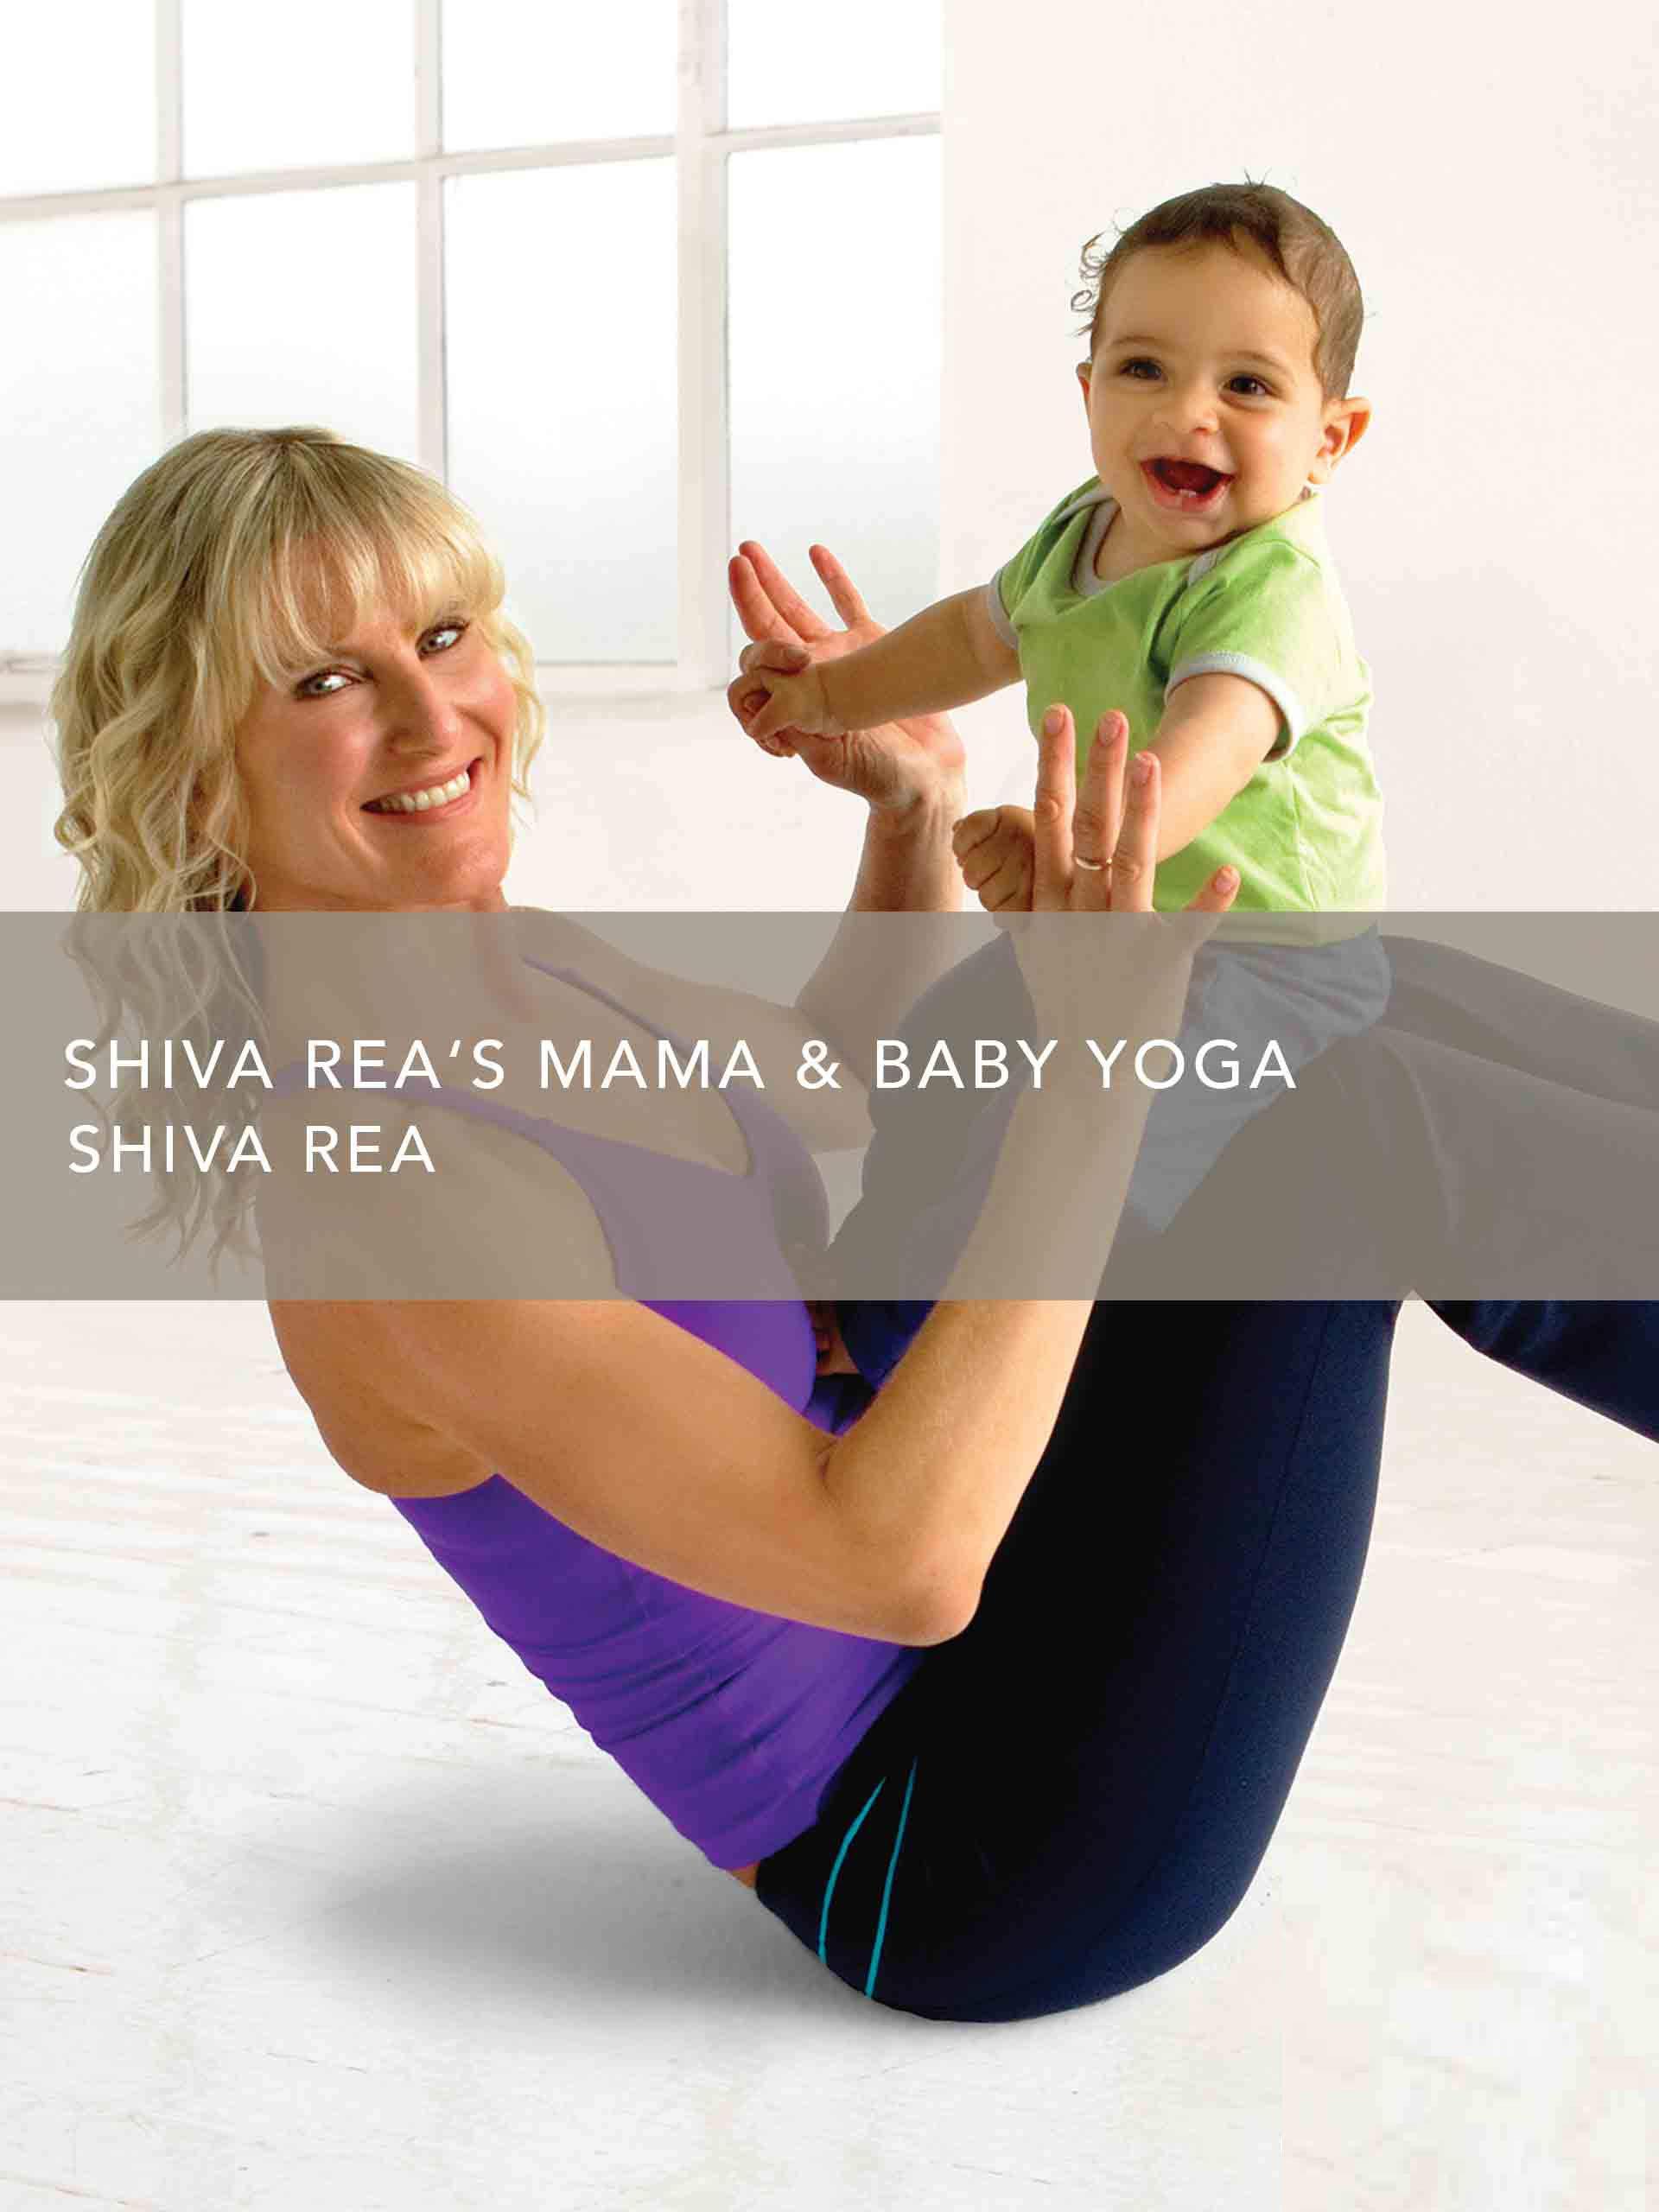 Watch Shiva Reas Mama & Baby Yoga - Season 1 | Prime Video